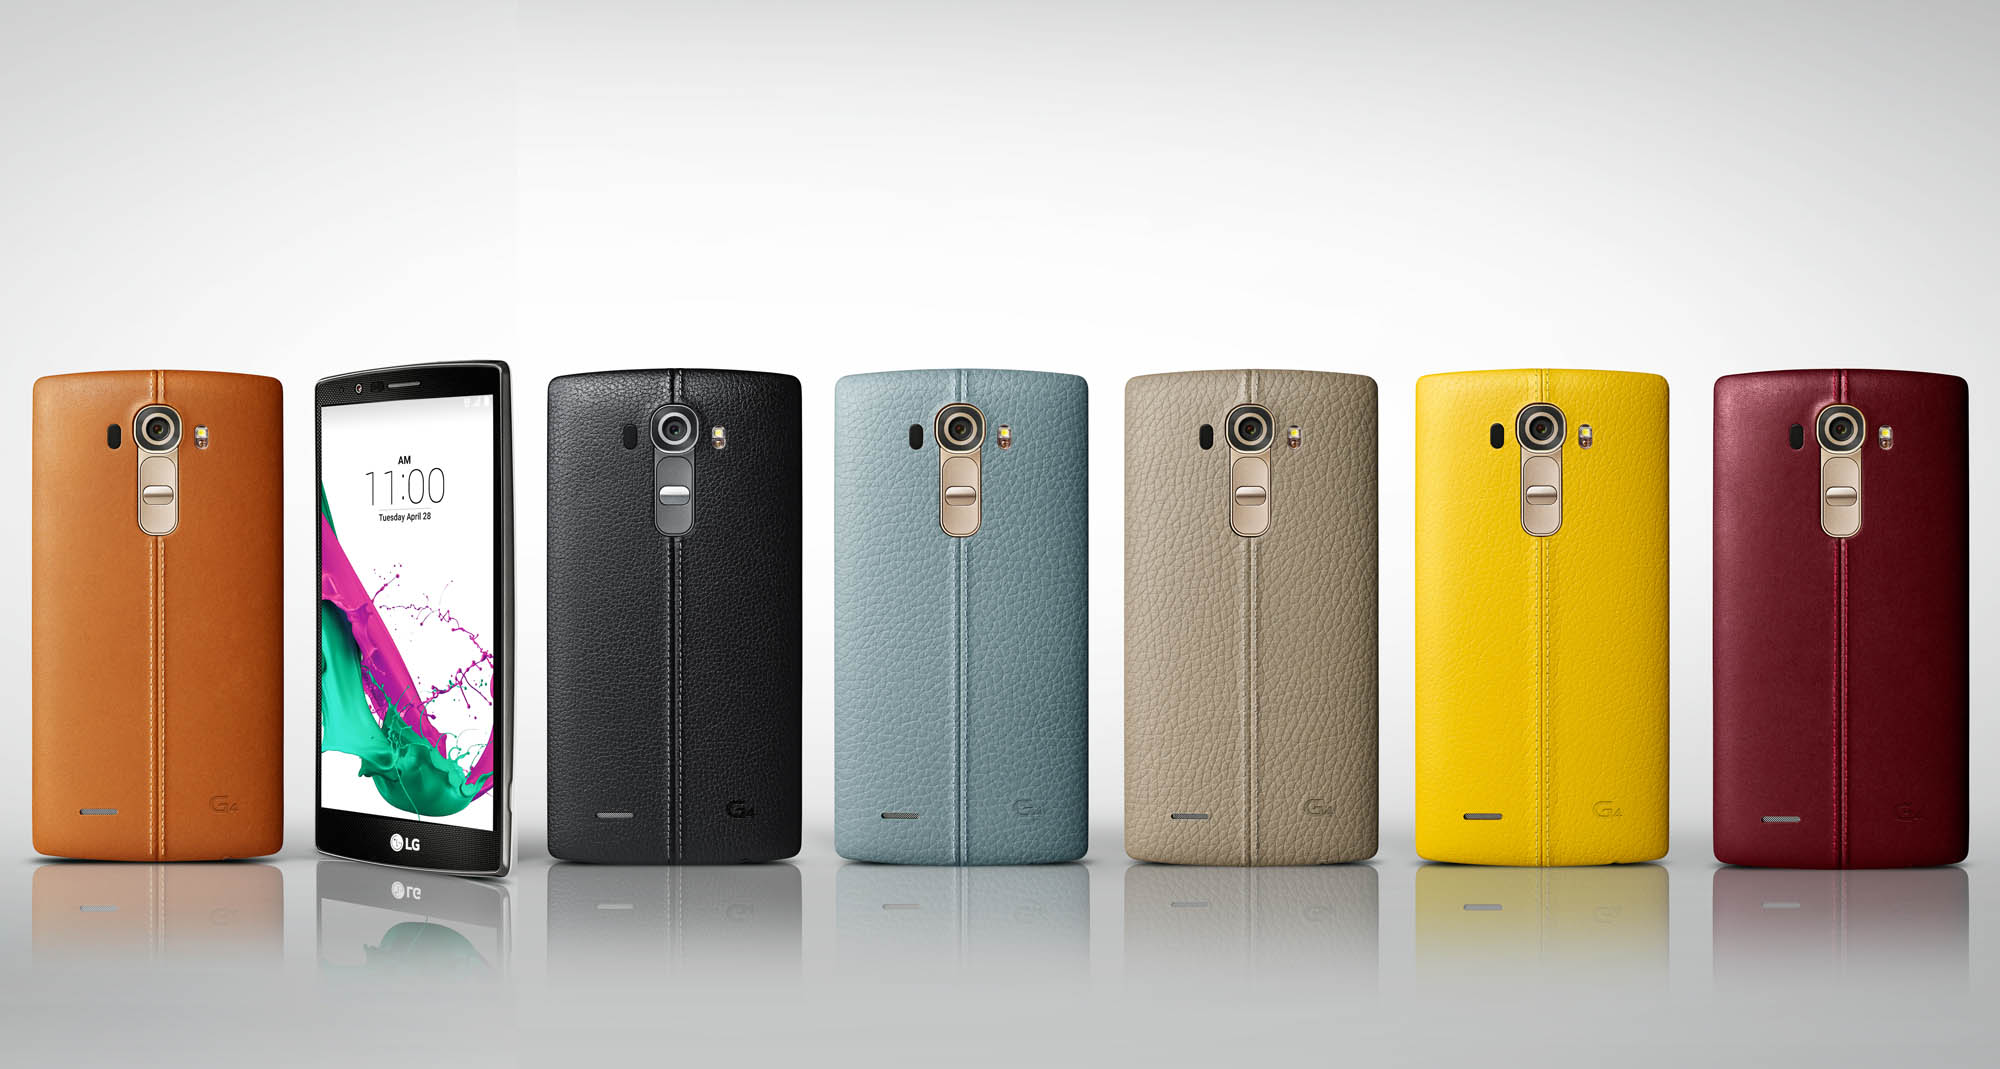 LG G4 - 1